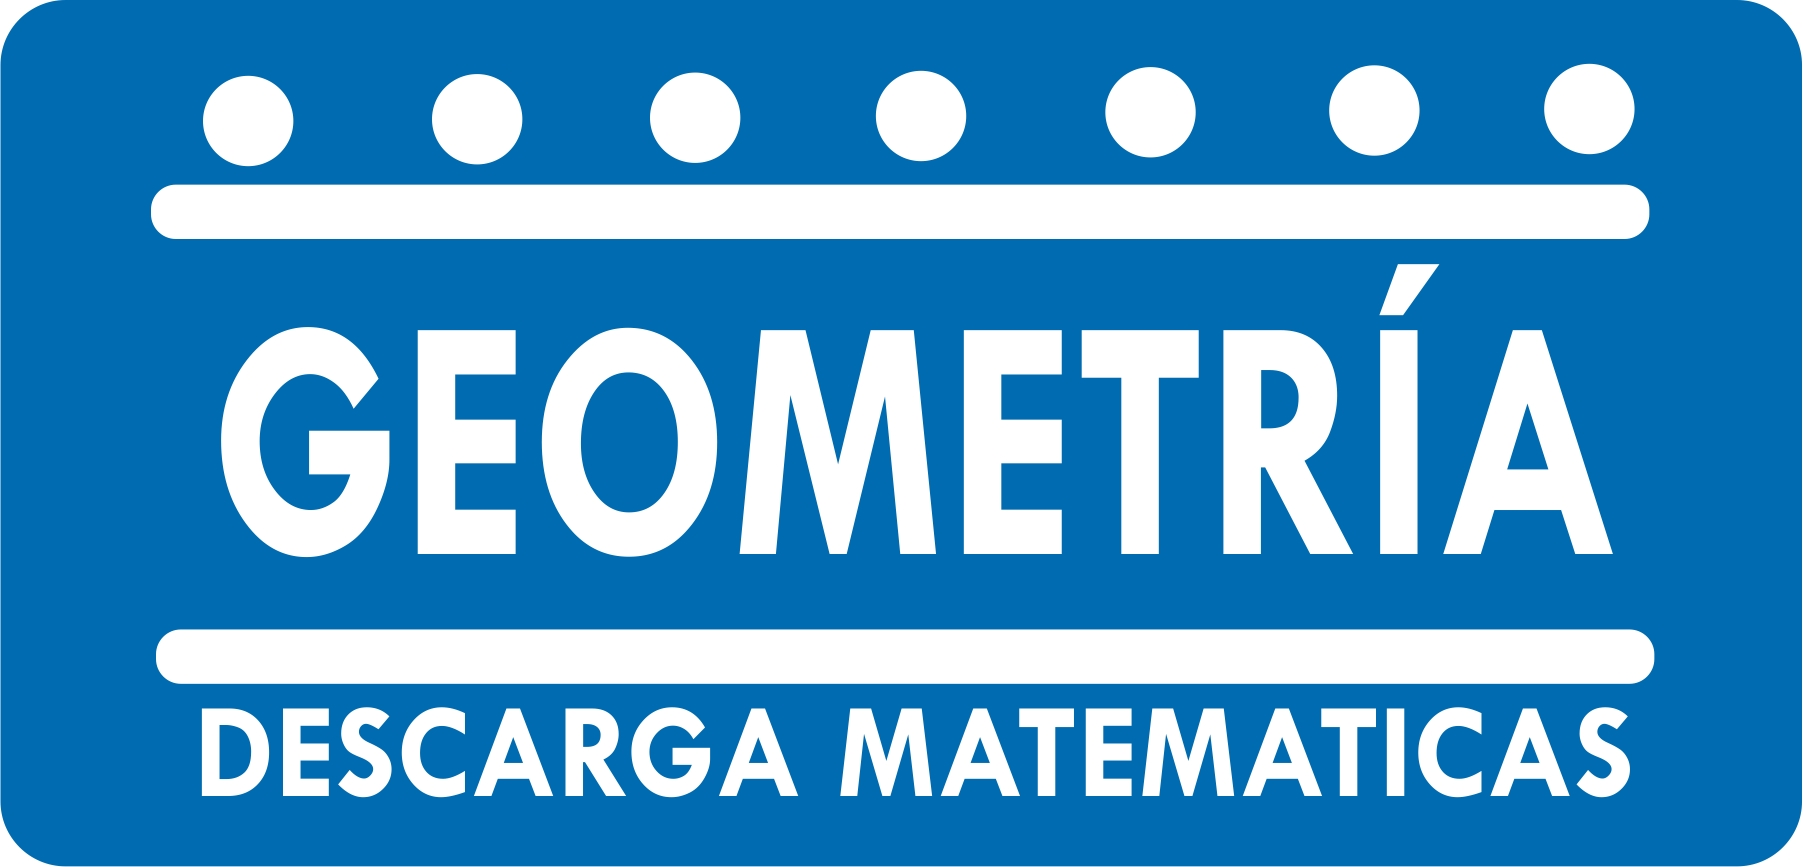 descarga matematicas geometria